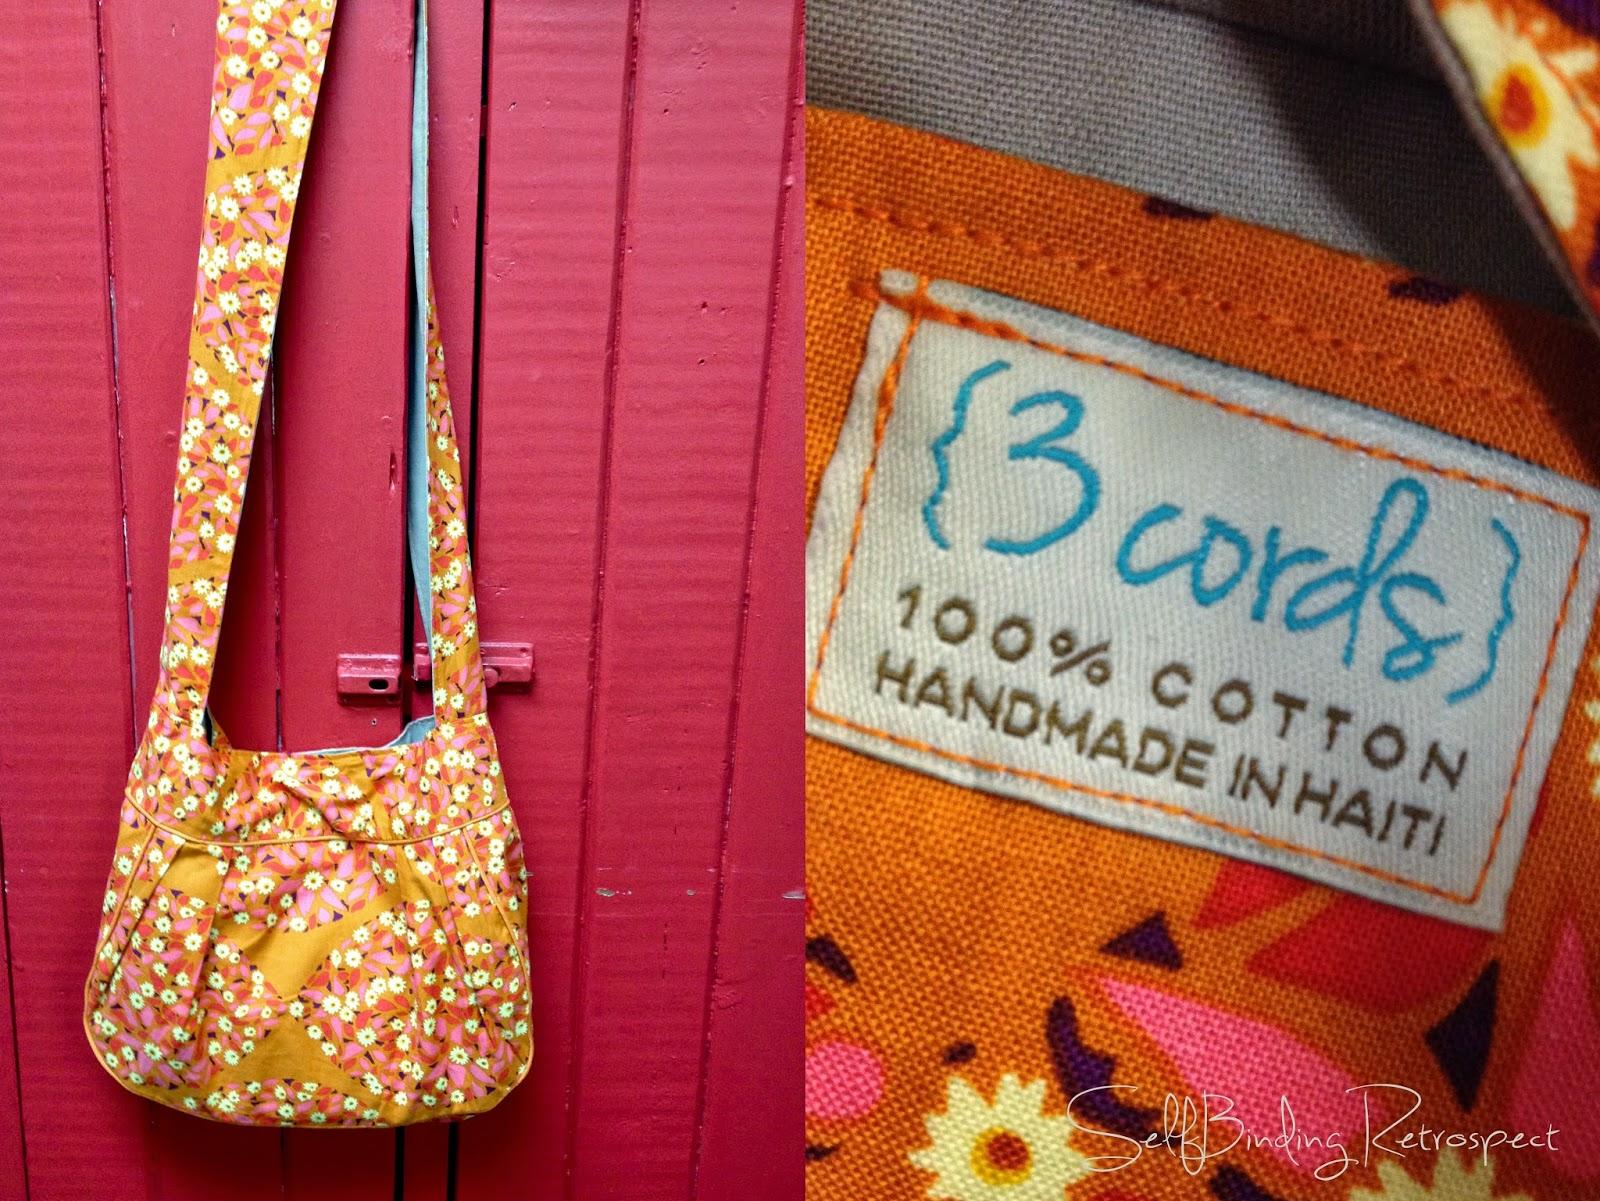 3 Cords purse, handmade in Haiti